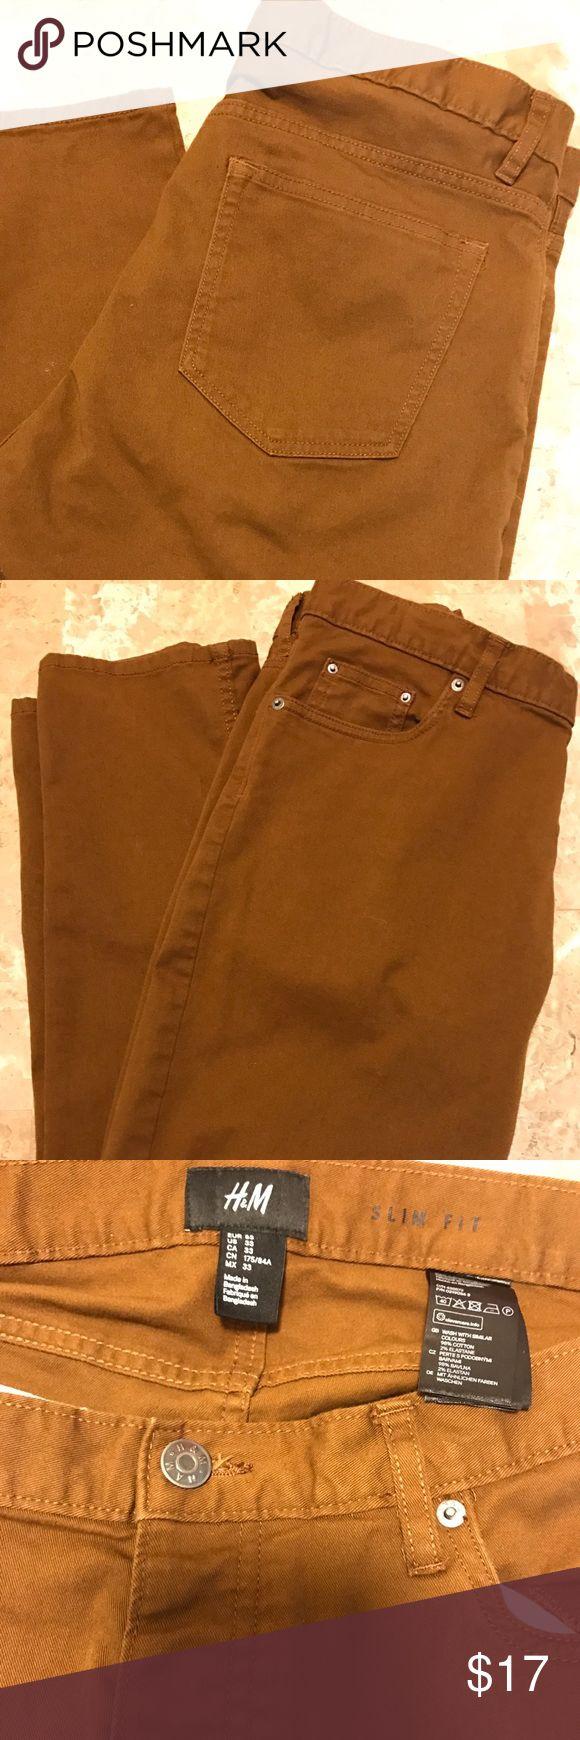 H&M Slim Fit Casual Slack Pants Men's H&M Casual Slack Pants Men's H&M  Pants